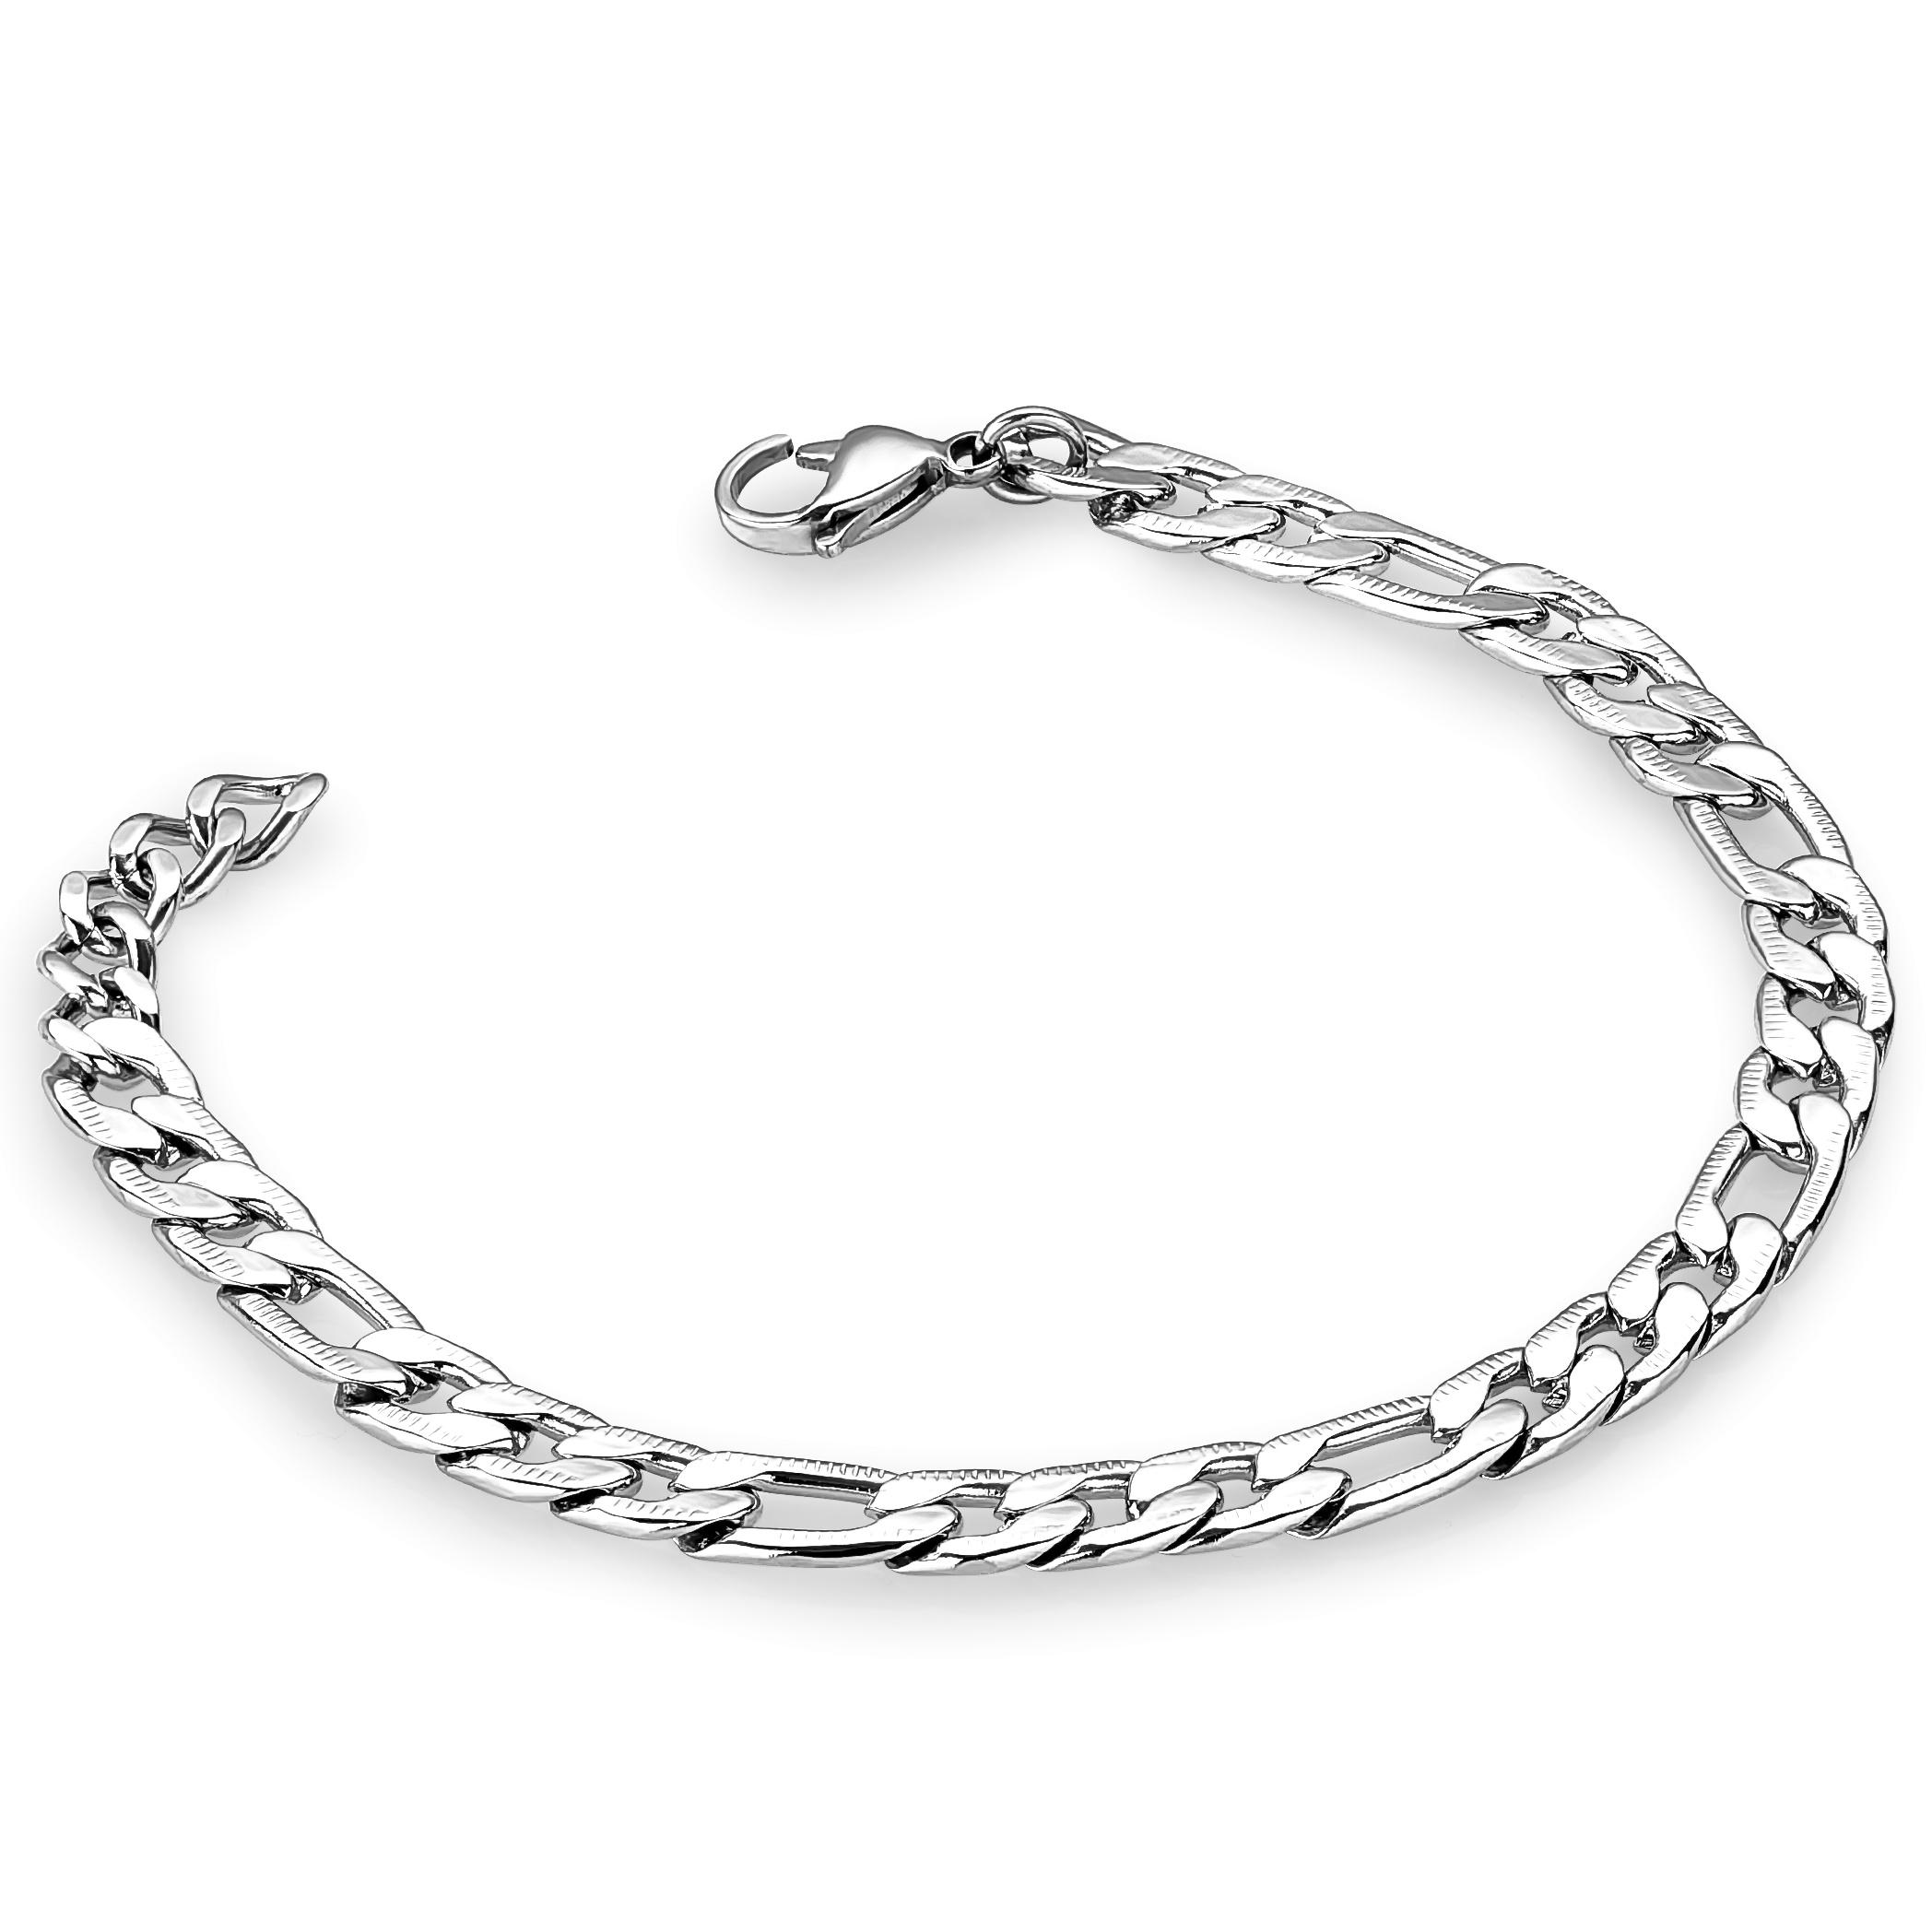 Bracelet de type figaro pour homme - Acier inoxydable